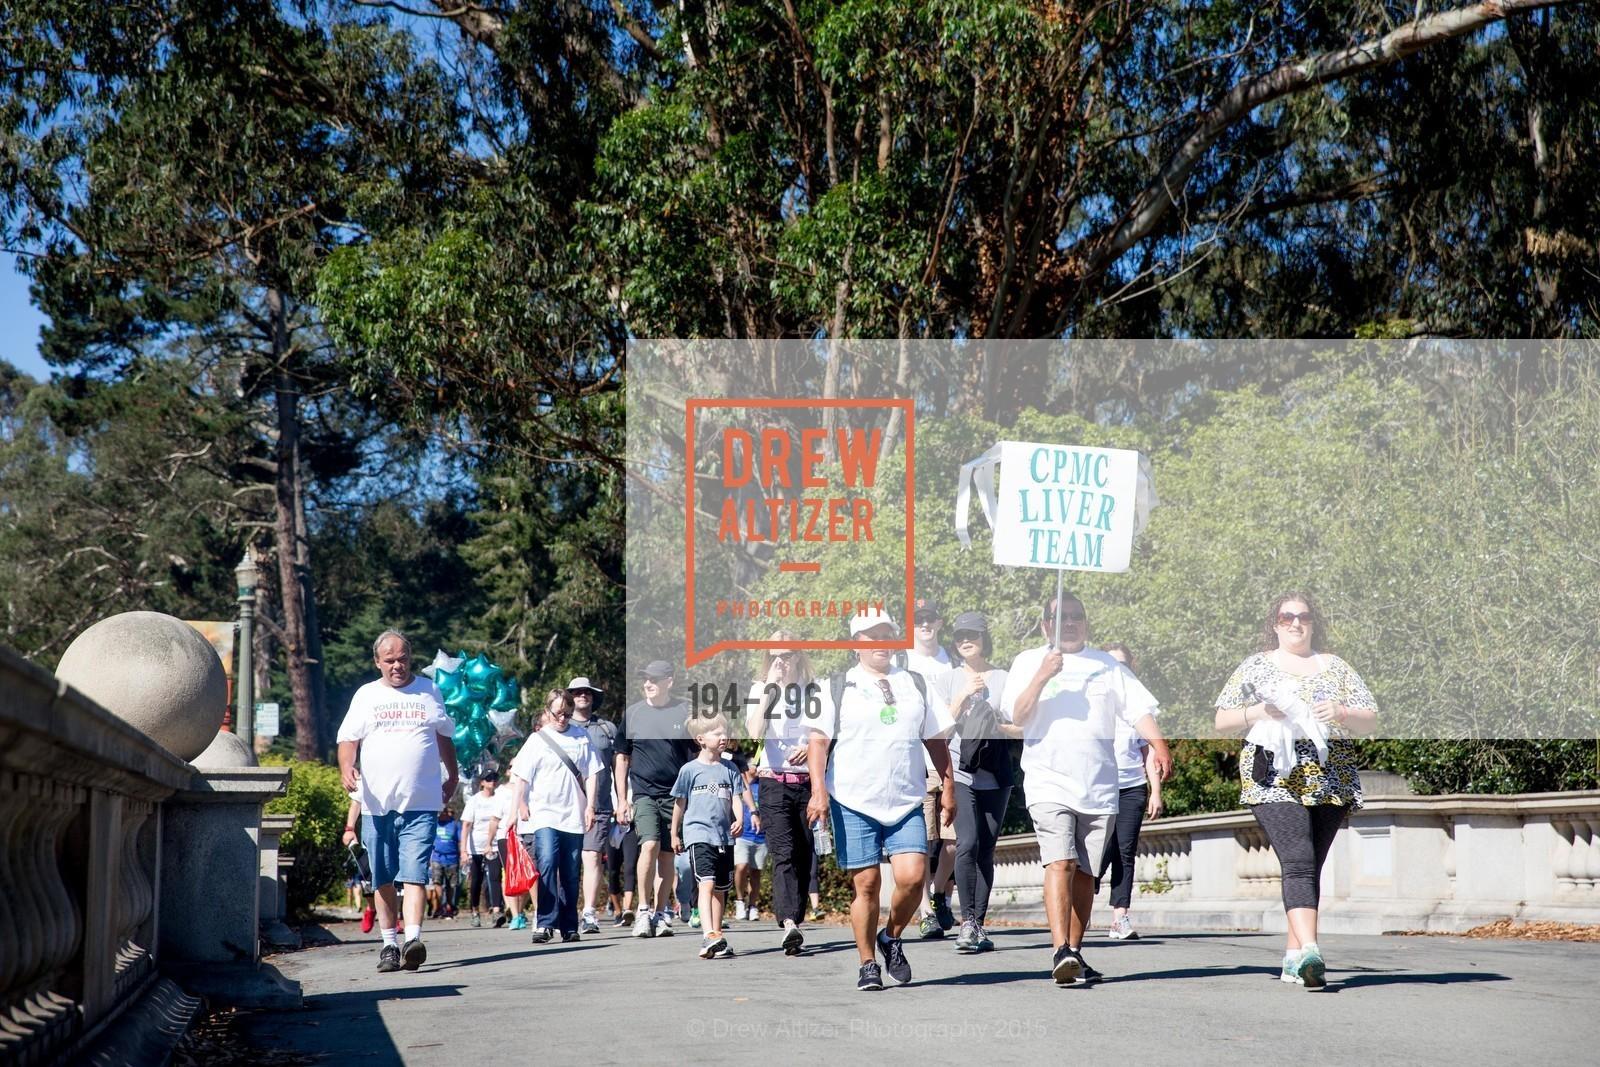 Atmosphere, American Liver Foundation - San Francisco Liver Life Walk 2015, September 20th, 2015, Photo,Drew Altizer, Drew Altizer Photography, full-service agency, private events, San Francisco photographer, photographer california